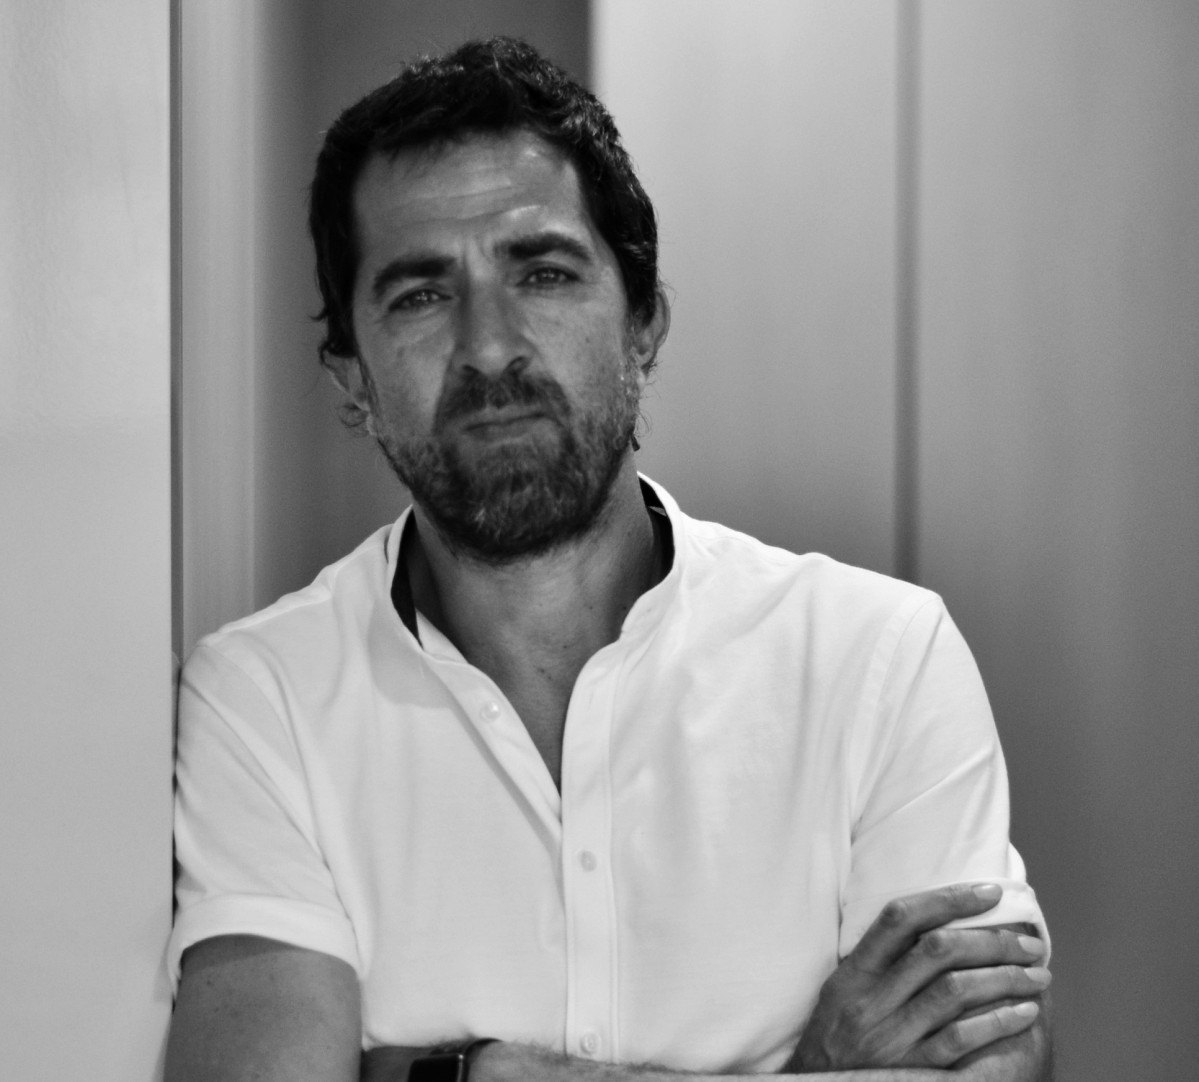 Foto Pere Cervantes 2018